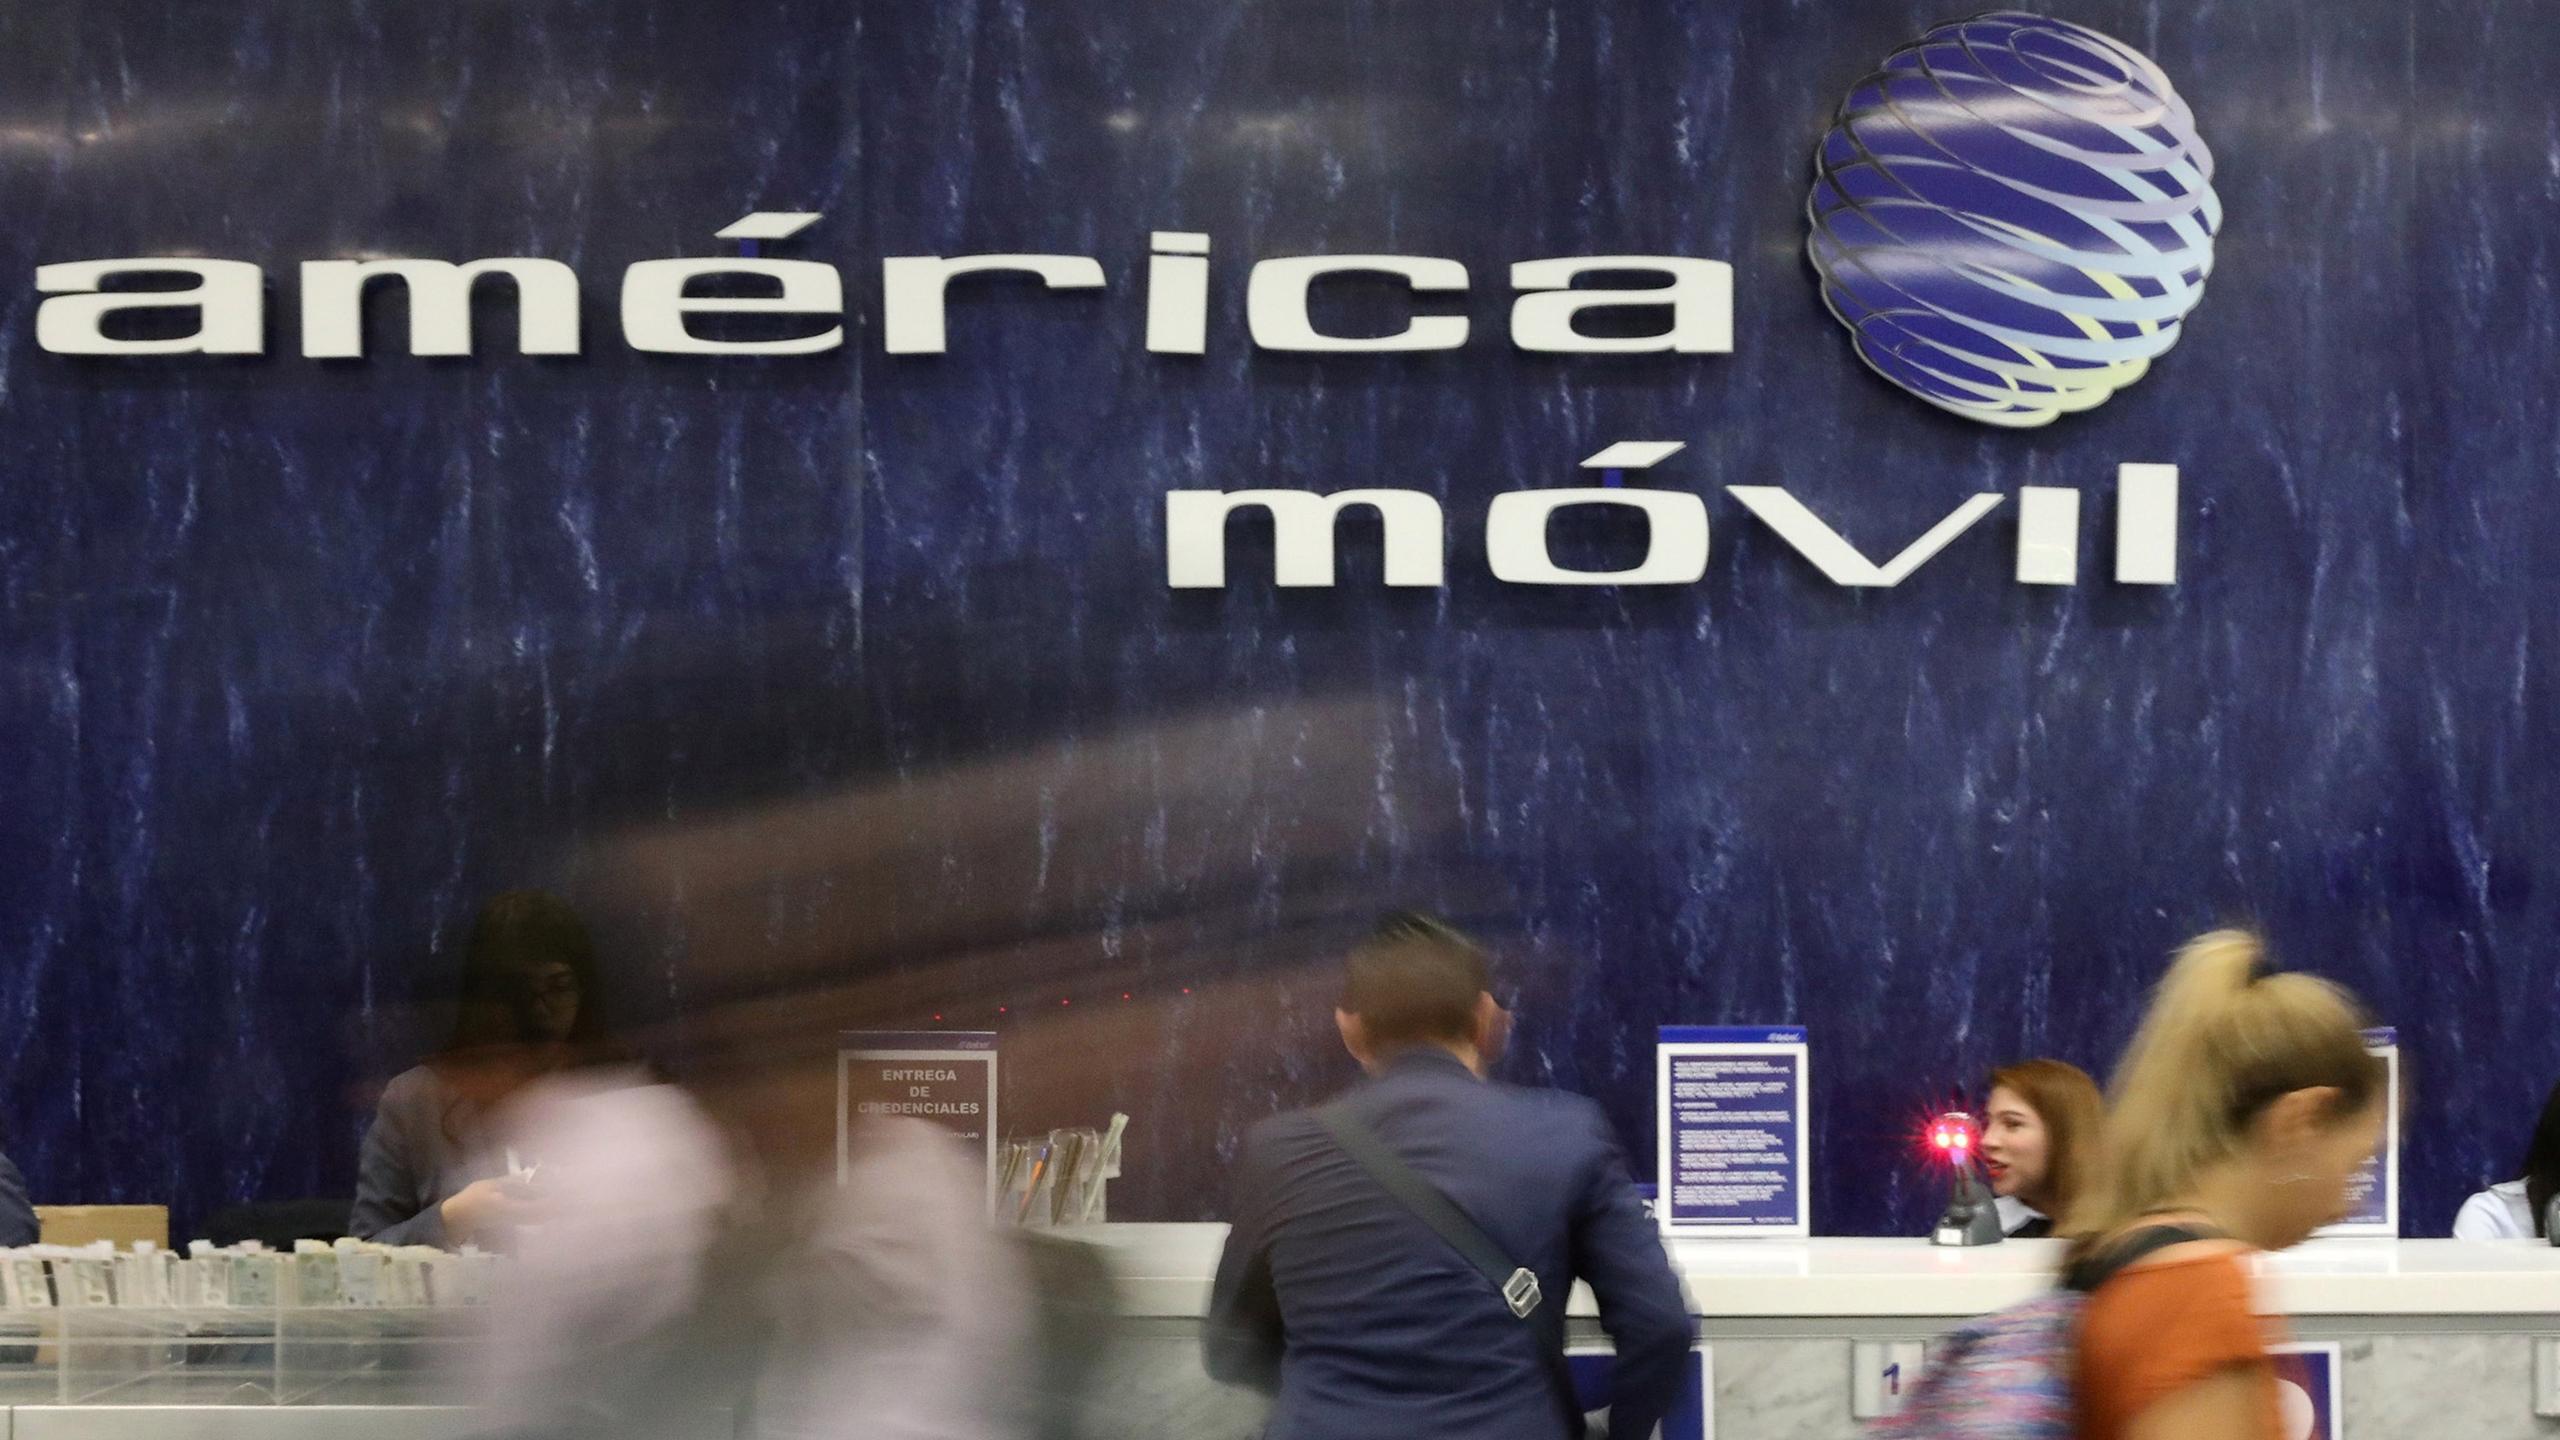 Flujo de América Móvil crece 7.2% en tercer trimestre